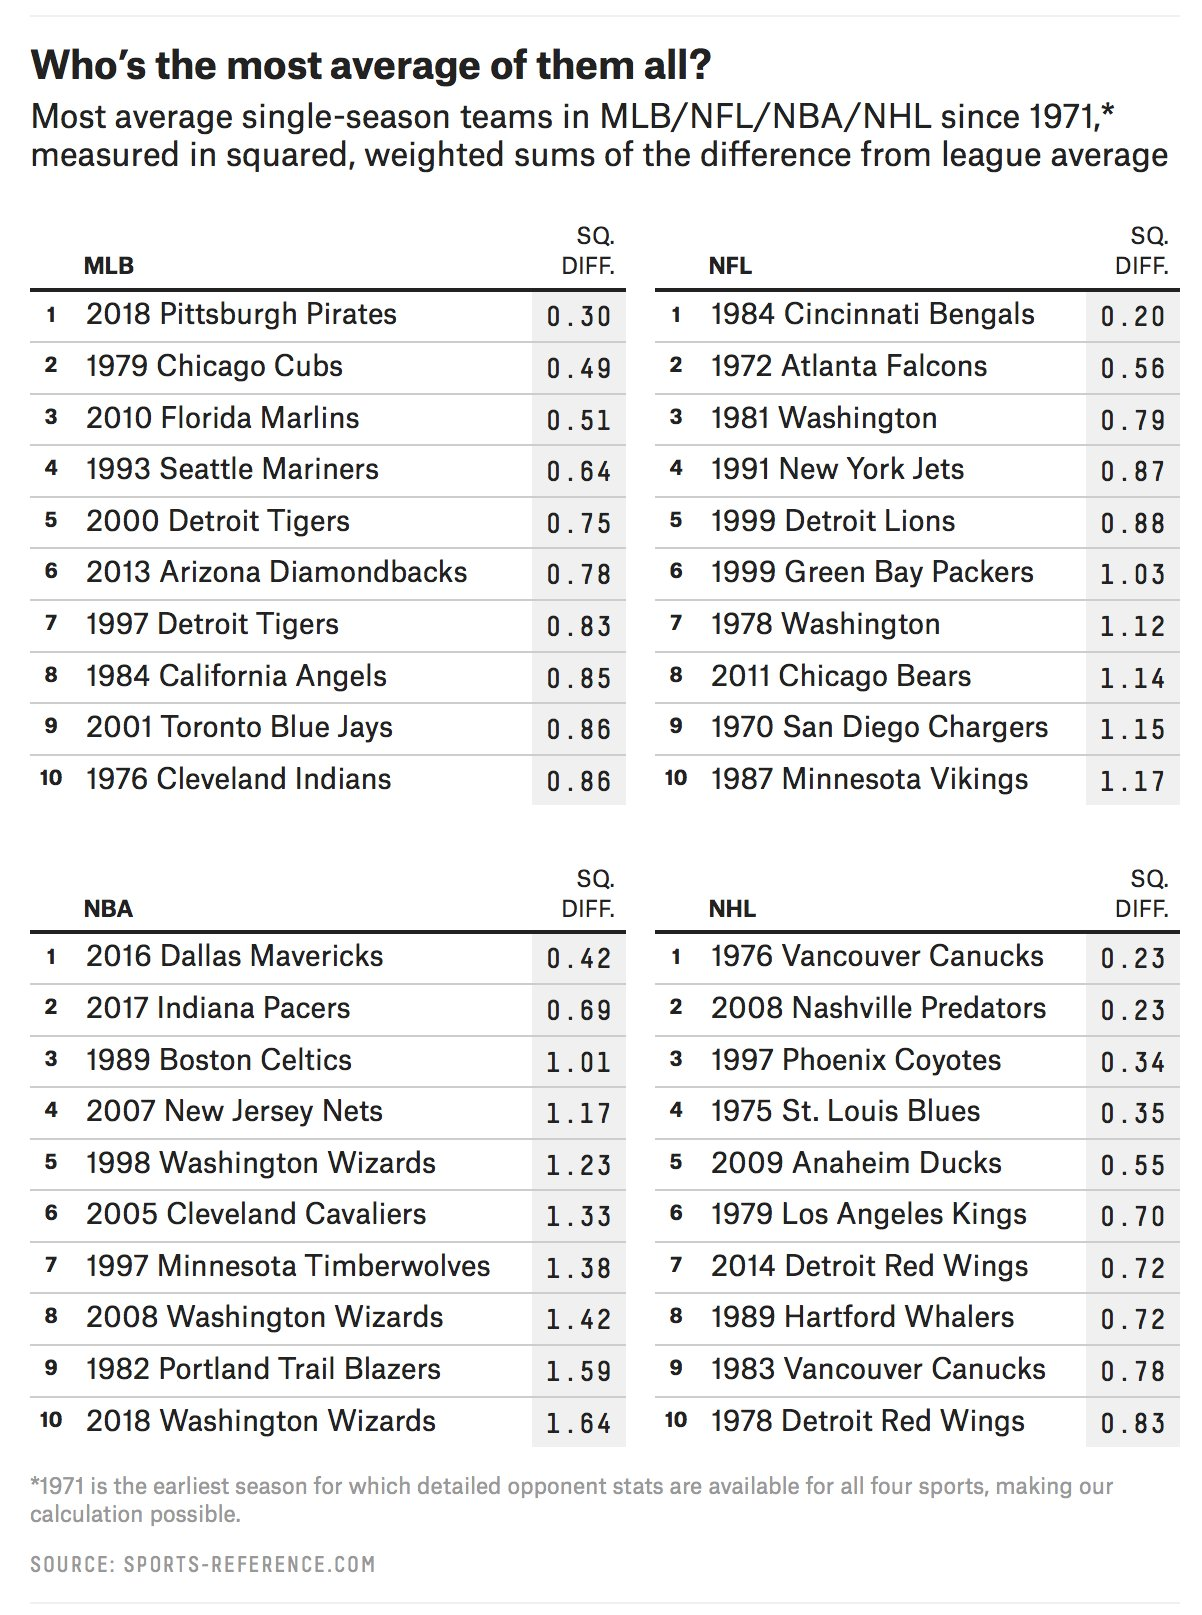 Here are the most average teams in each sport since 1971: https://t.co/Tz3rlBnCu2 https://t.co/BvKD0EaY8d